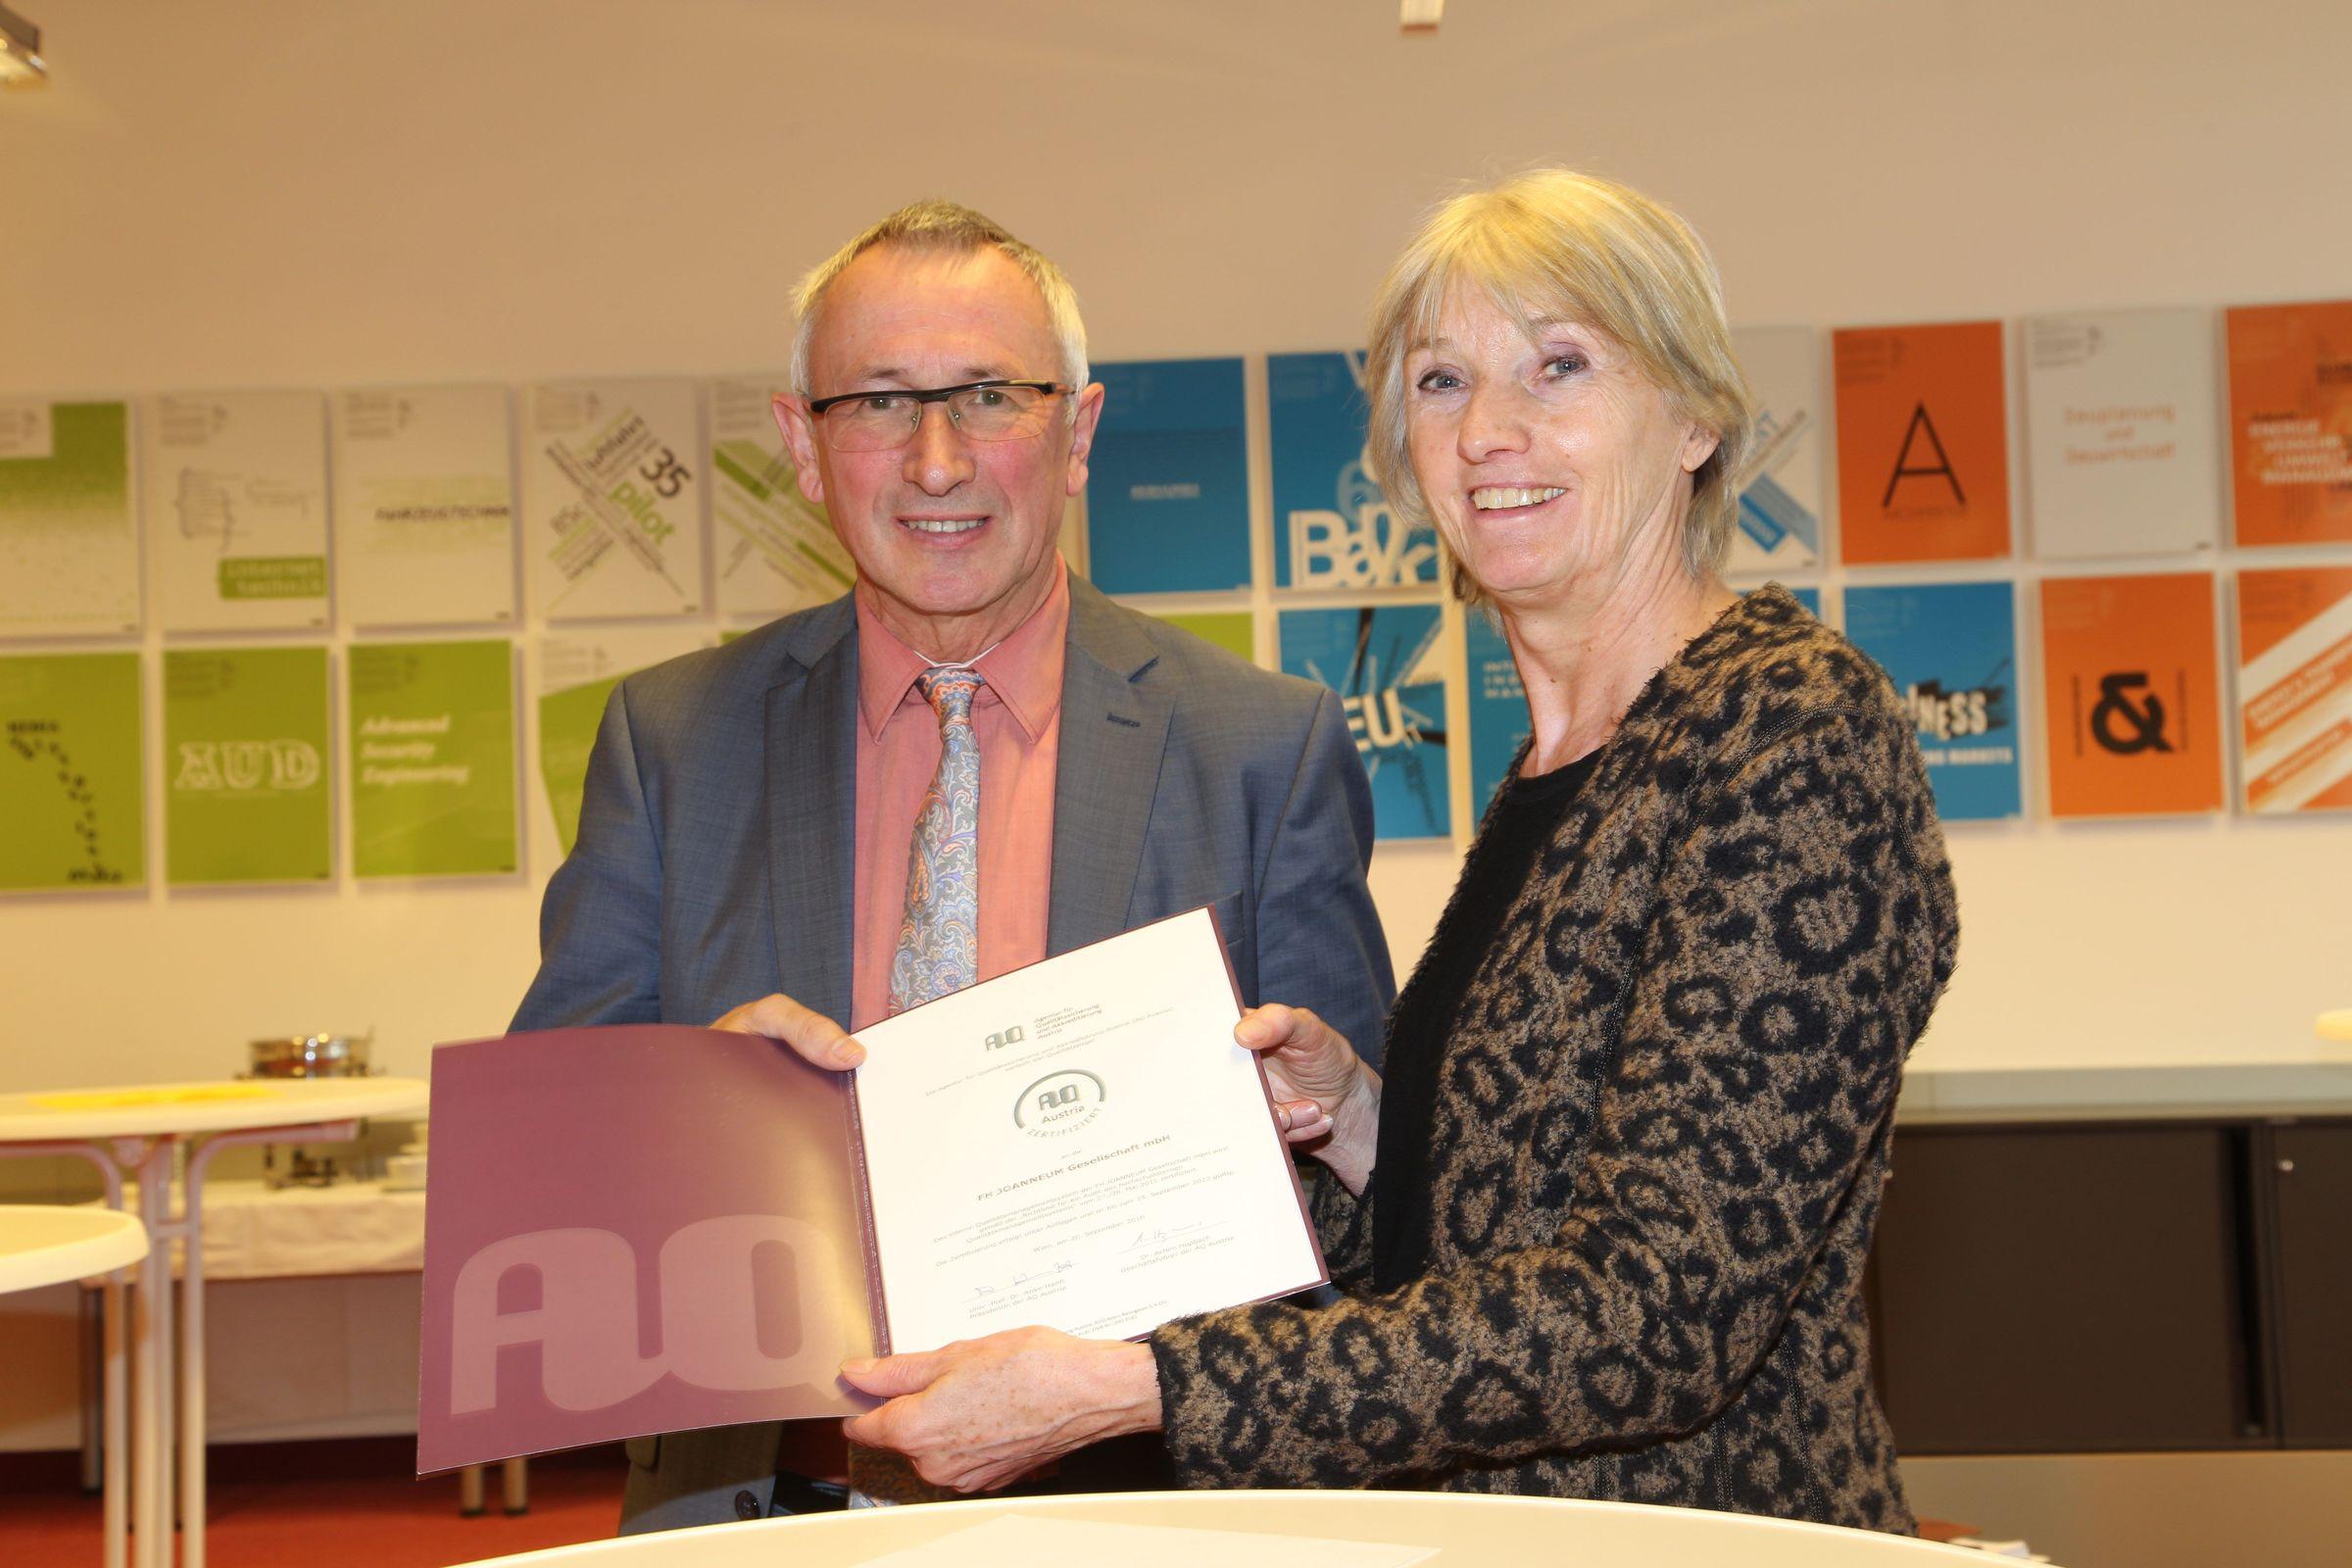 Rektor Univ.-Prof. DI Dr. Karl Peter Pfeiffer nahm das Zertifikat von Univ.Prof. Dr. Anke Hanft entgegen.